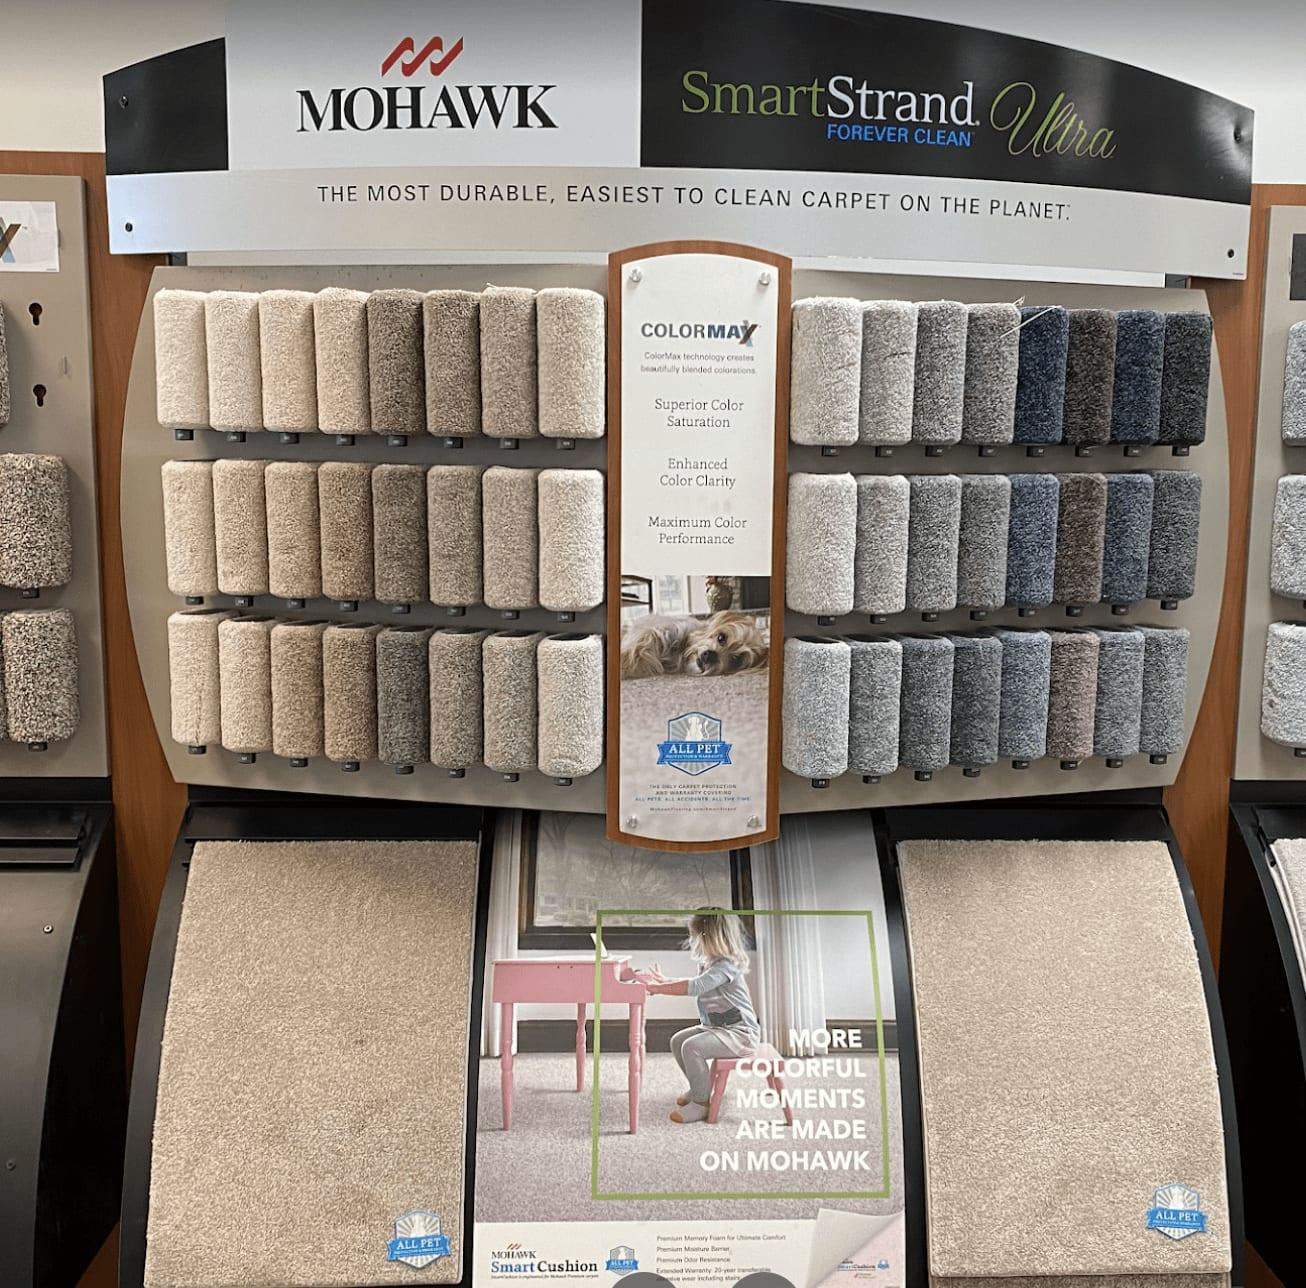 Mohawk SmartStrand carpet for your Barrington, IL home from Alpha Carpet & Flooring